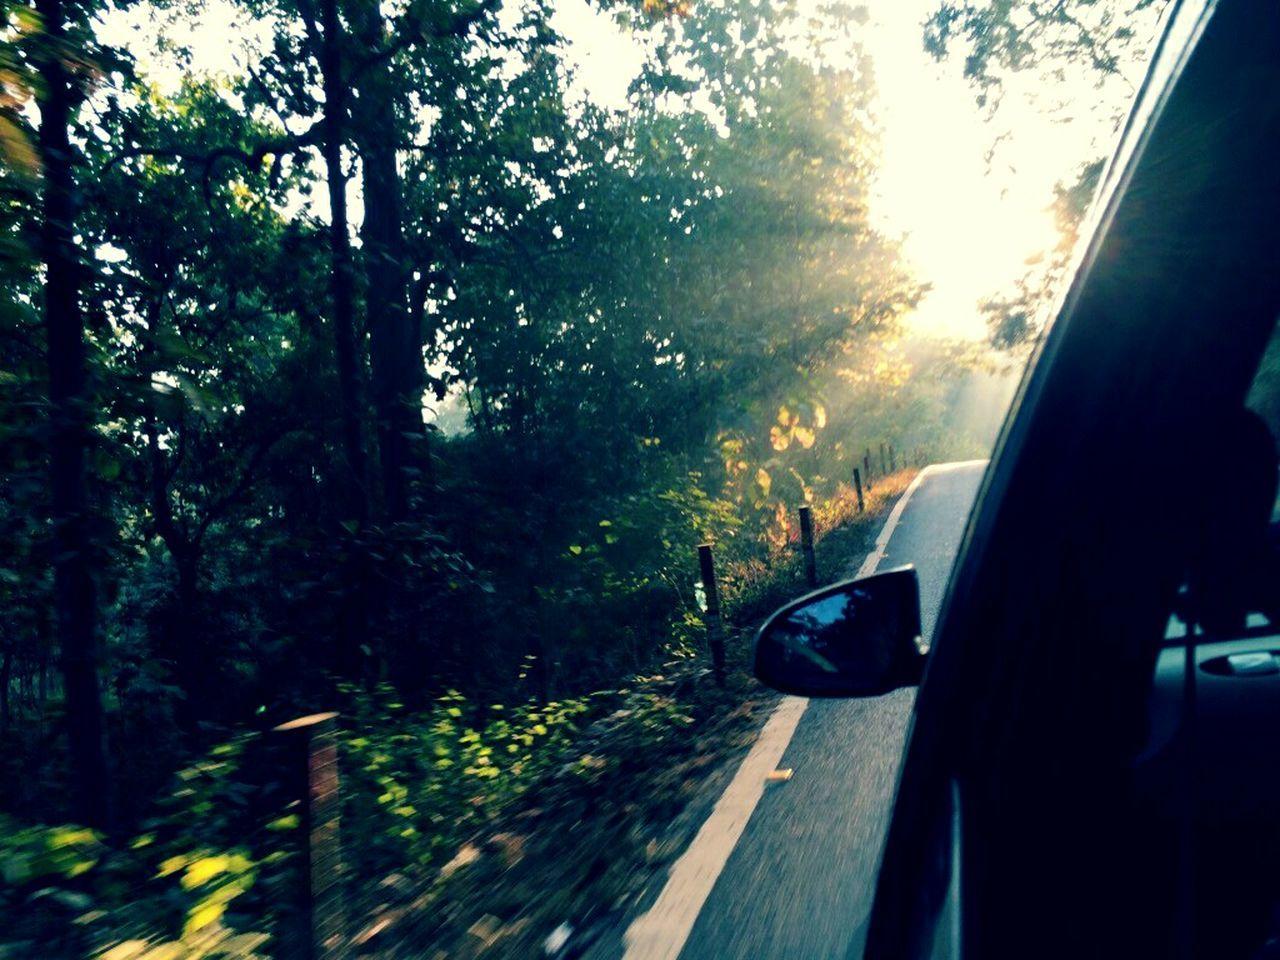 Drivethrough Sunshine ☀ Friends Roadtrip Cold Days Travel Diaries The Following